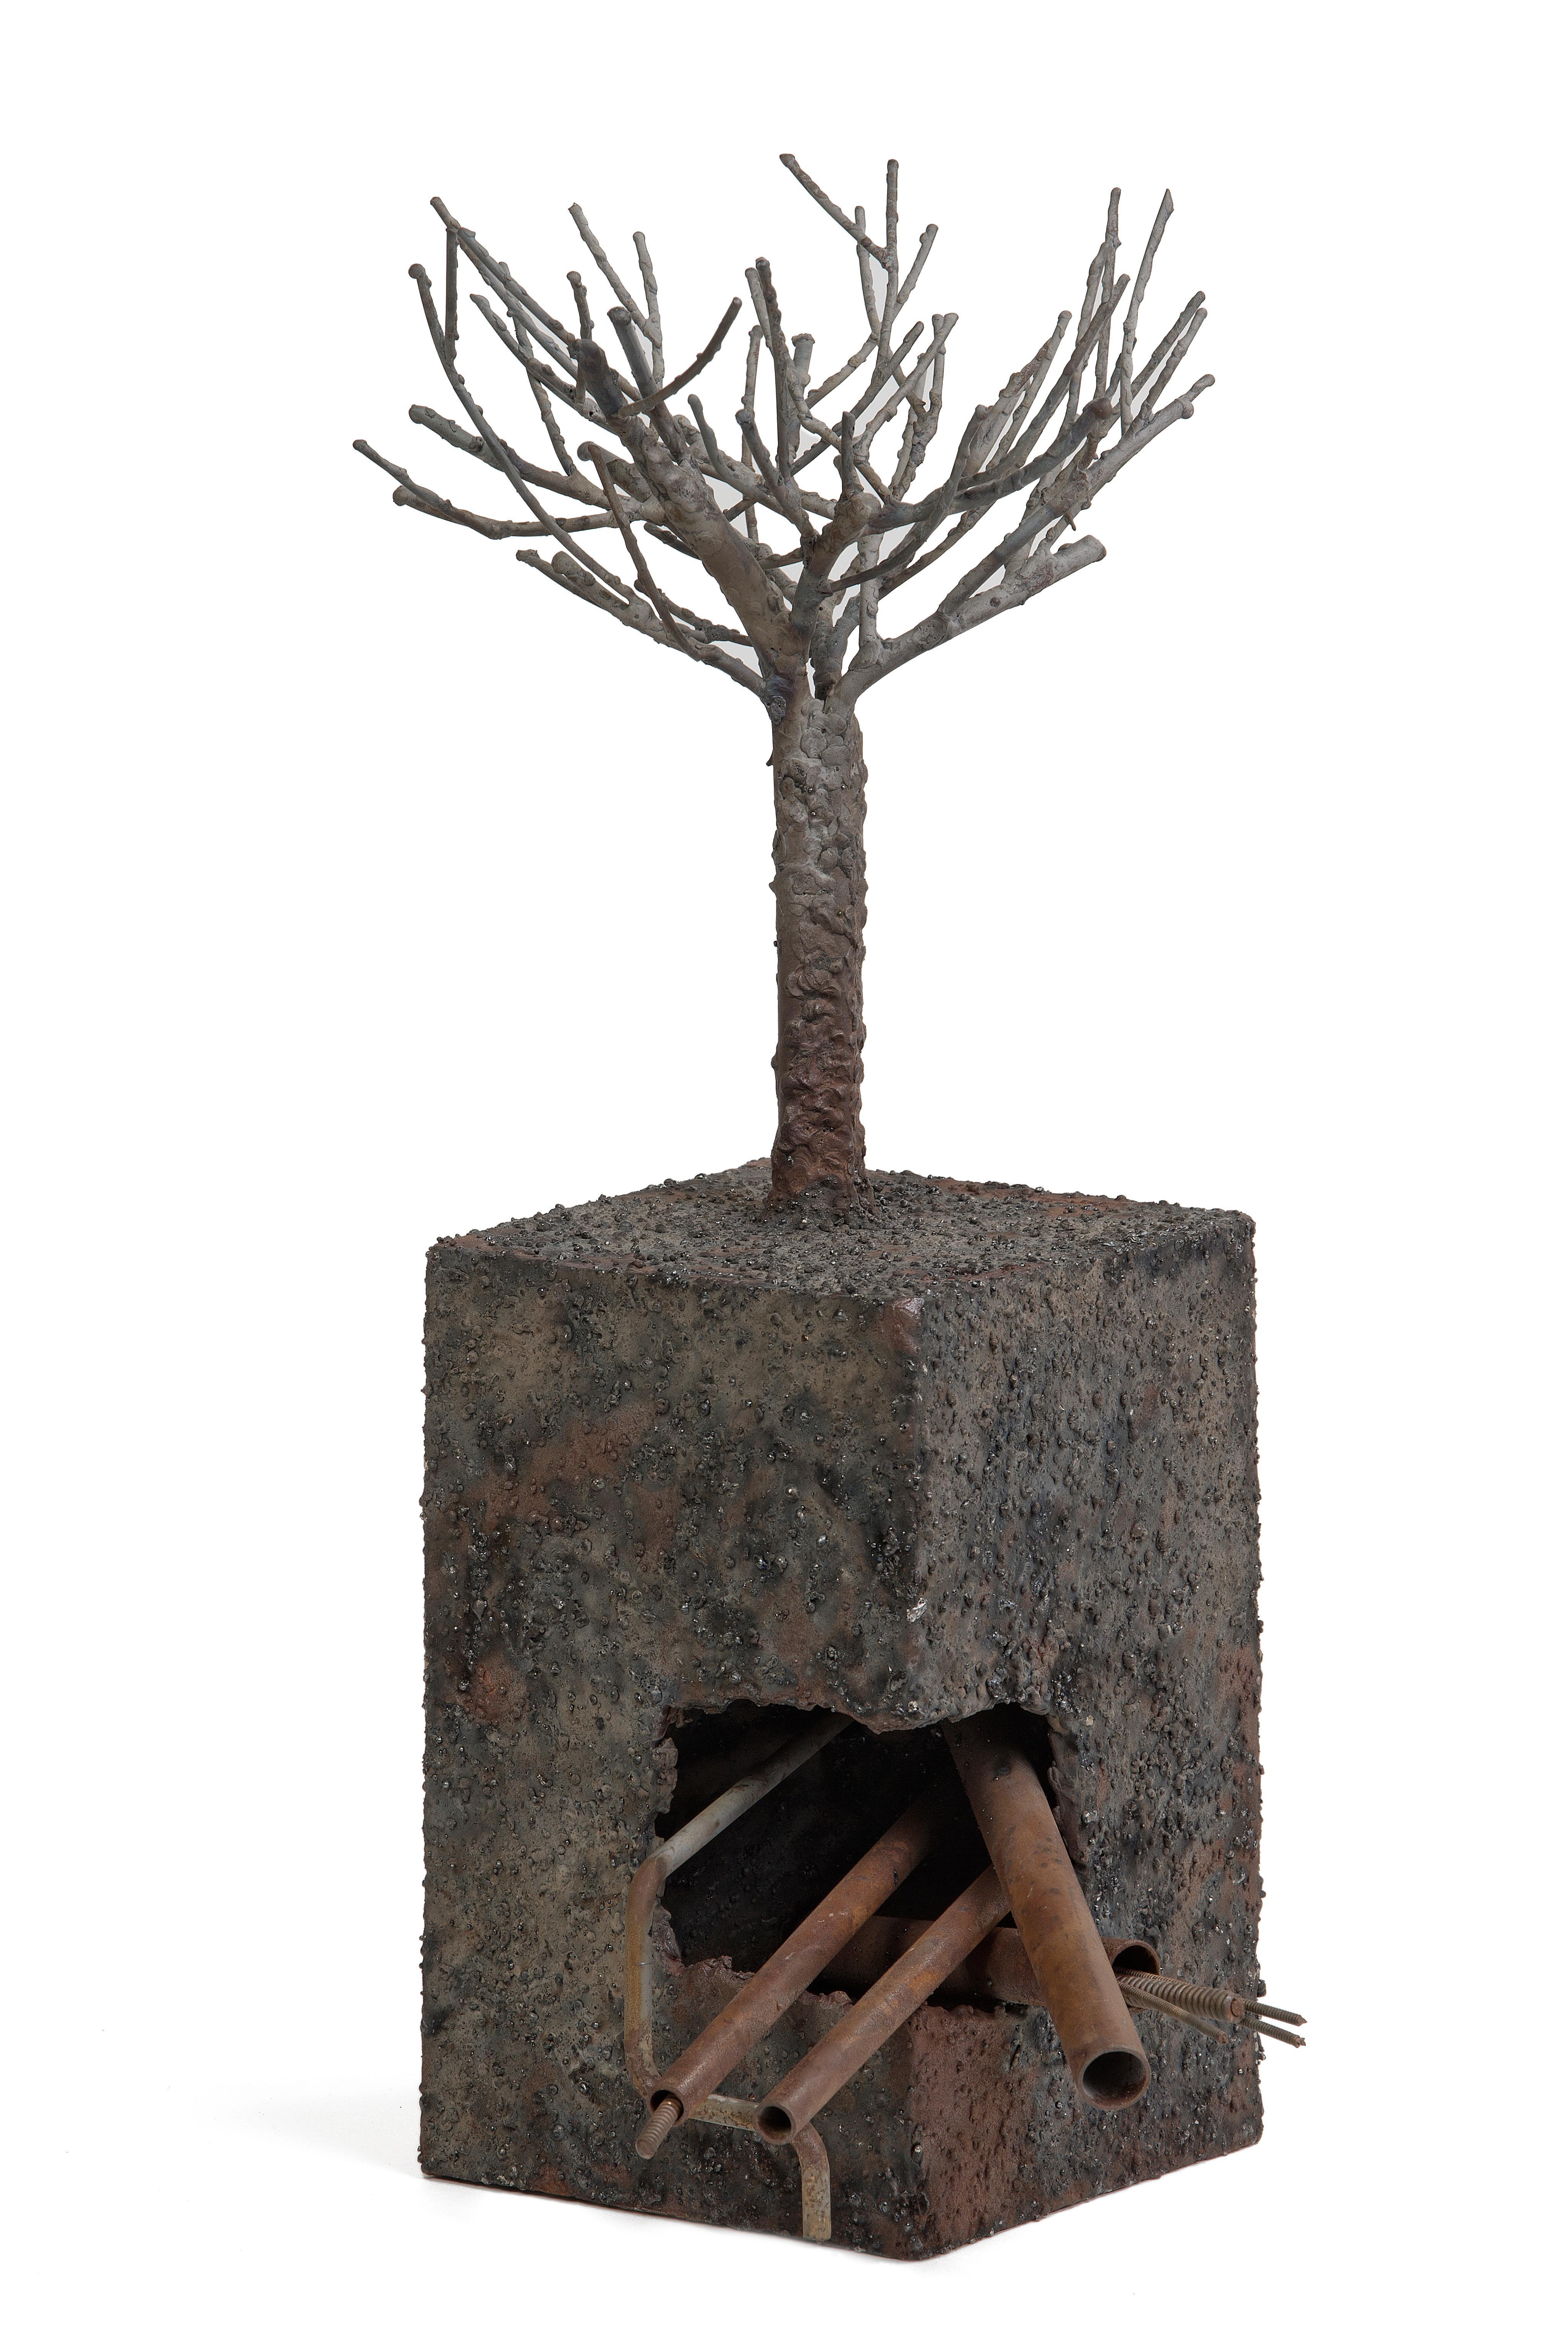 Tree and subsoil, the city - Jean-Paul Réti, Contemporary metal sculpture